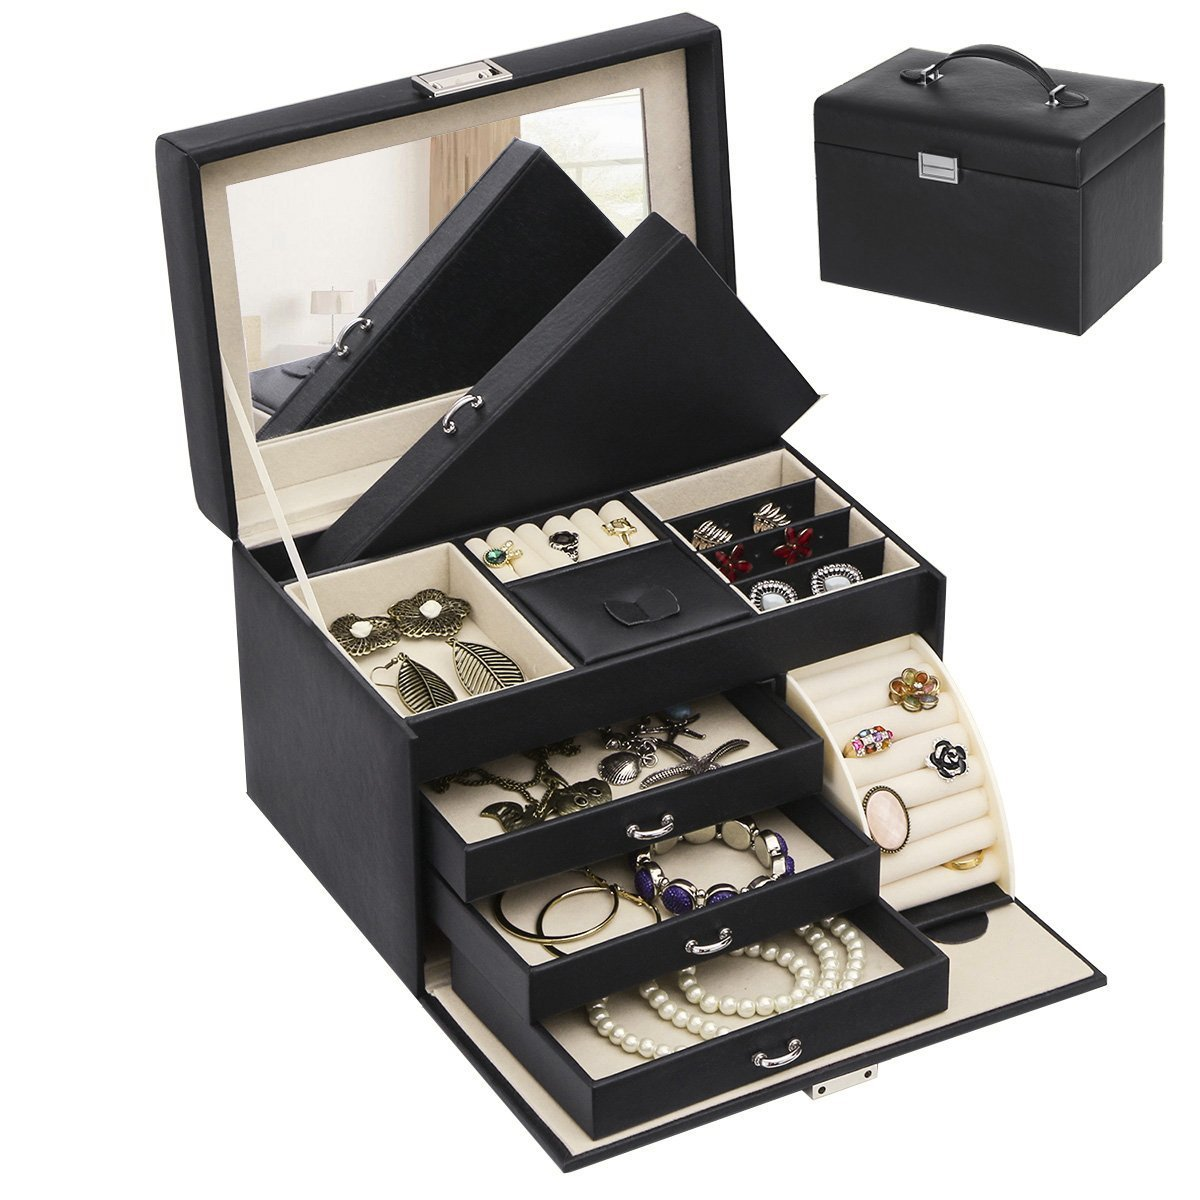 BEWISHOME Jewelry Box Organizer Case Display Storage W/Travel Case Large Mirrored 10 1/4'' x 7 1/16'' x 6 11/16'' Black PU Leather for Girls Women SSH53B by BEWISHOME